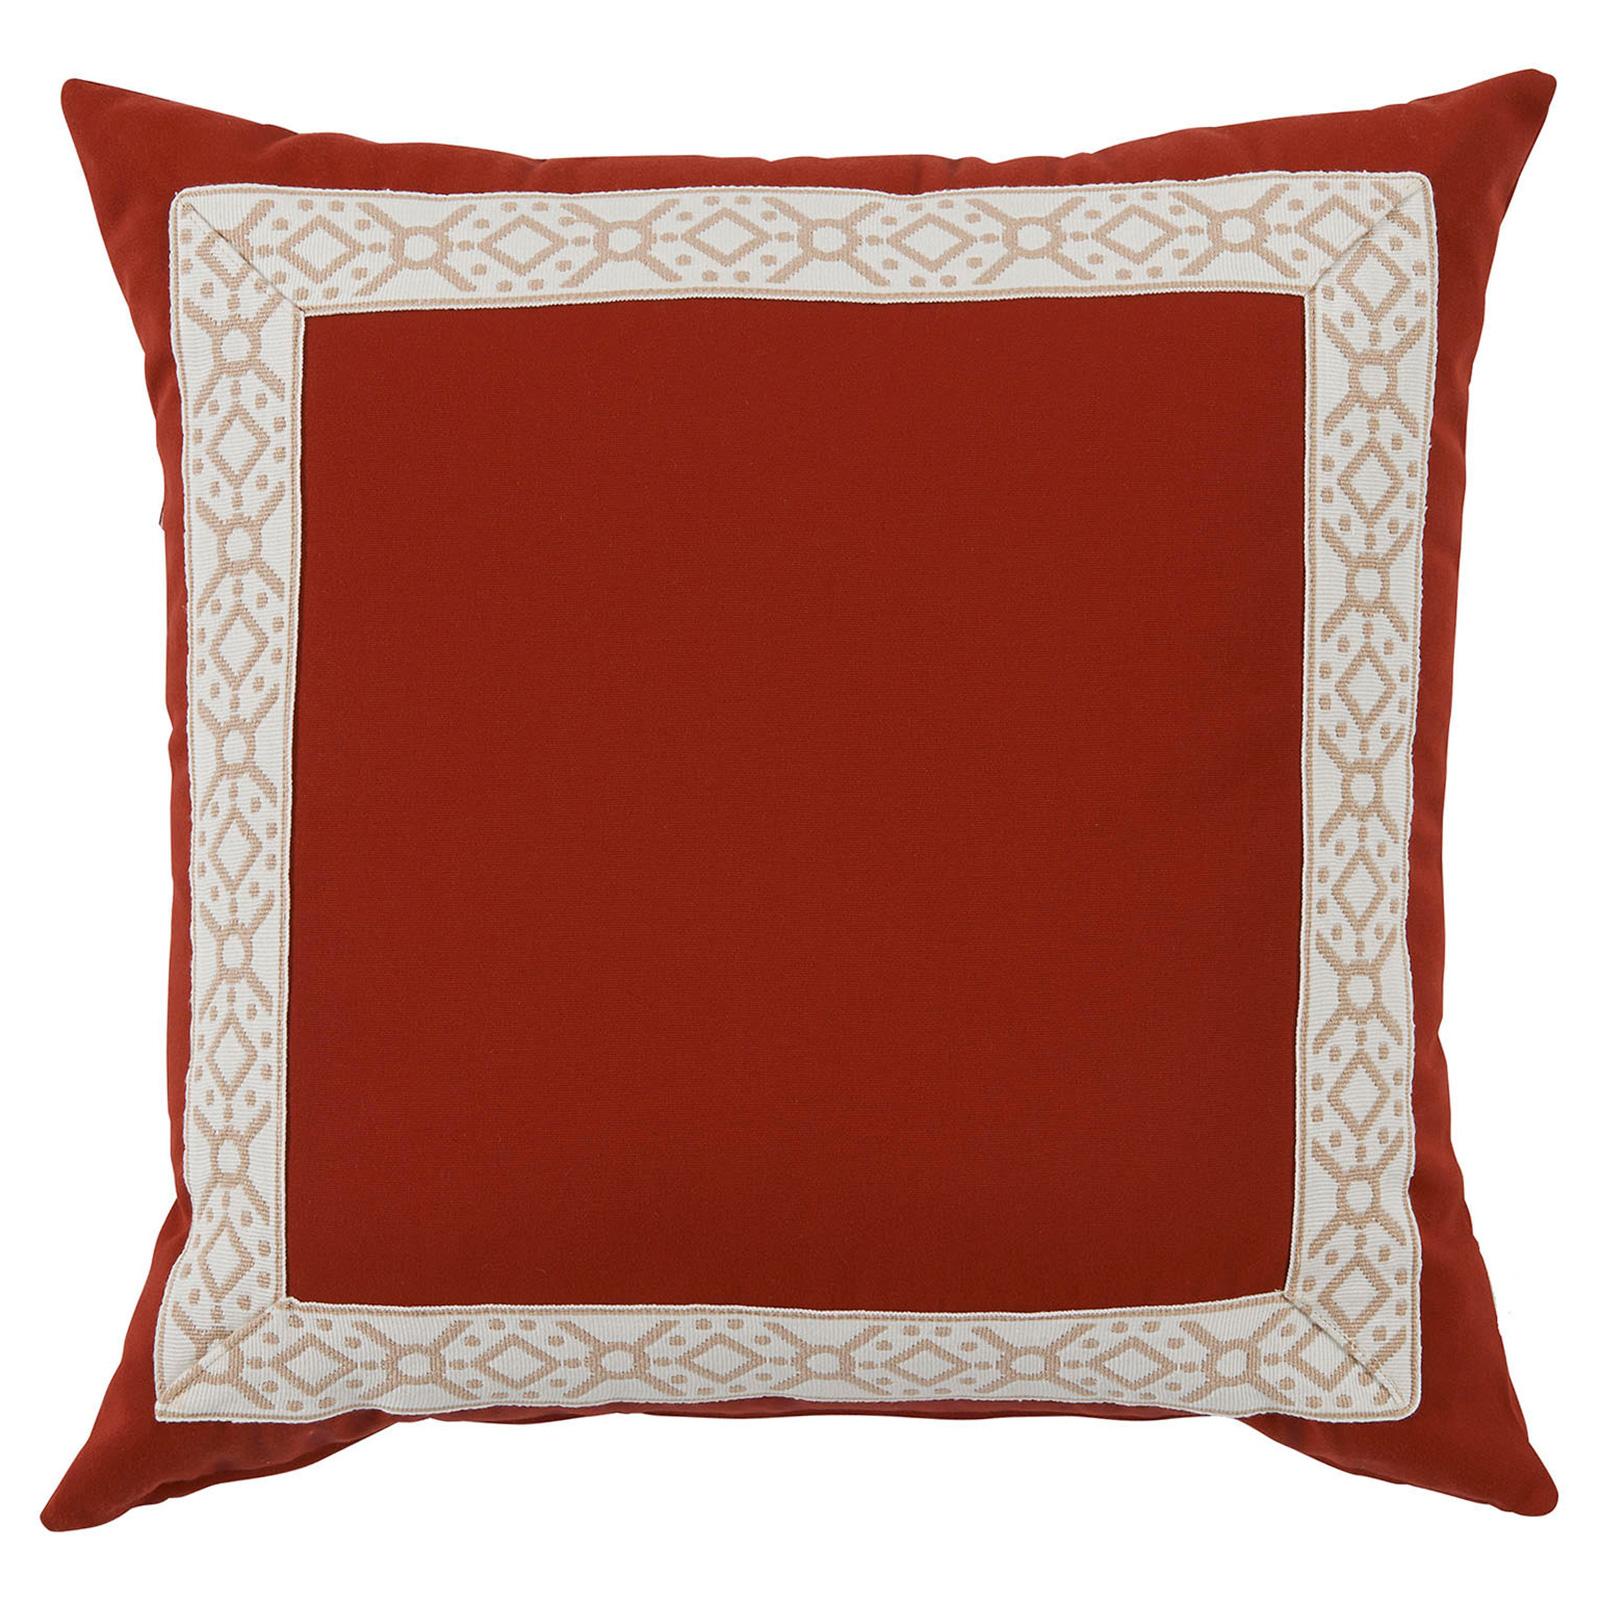 Perri Modern Global Trim Red Outdoor Pillow - 22x22